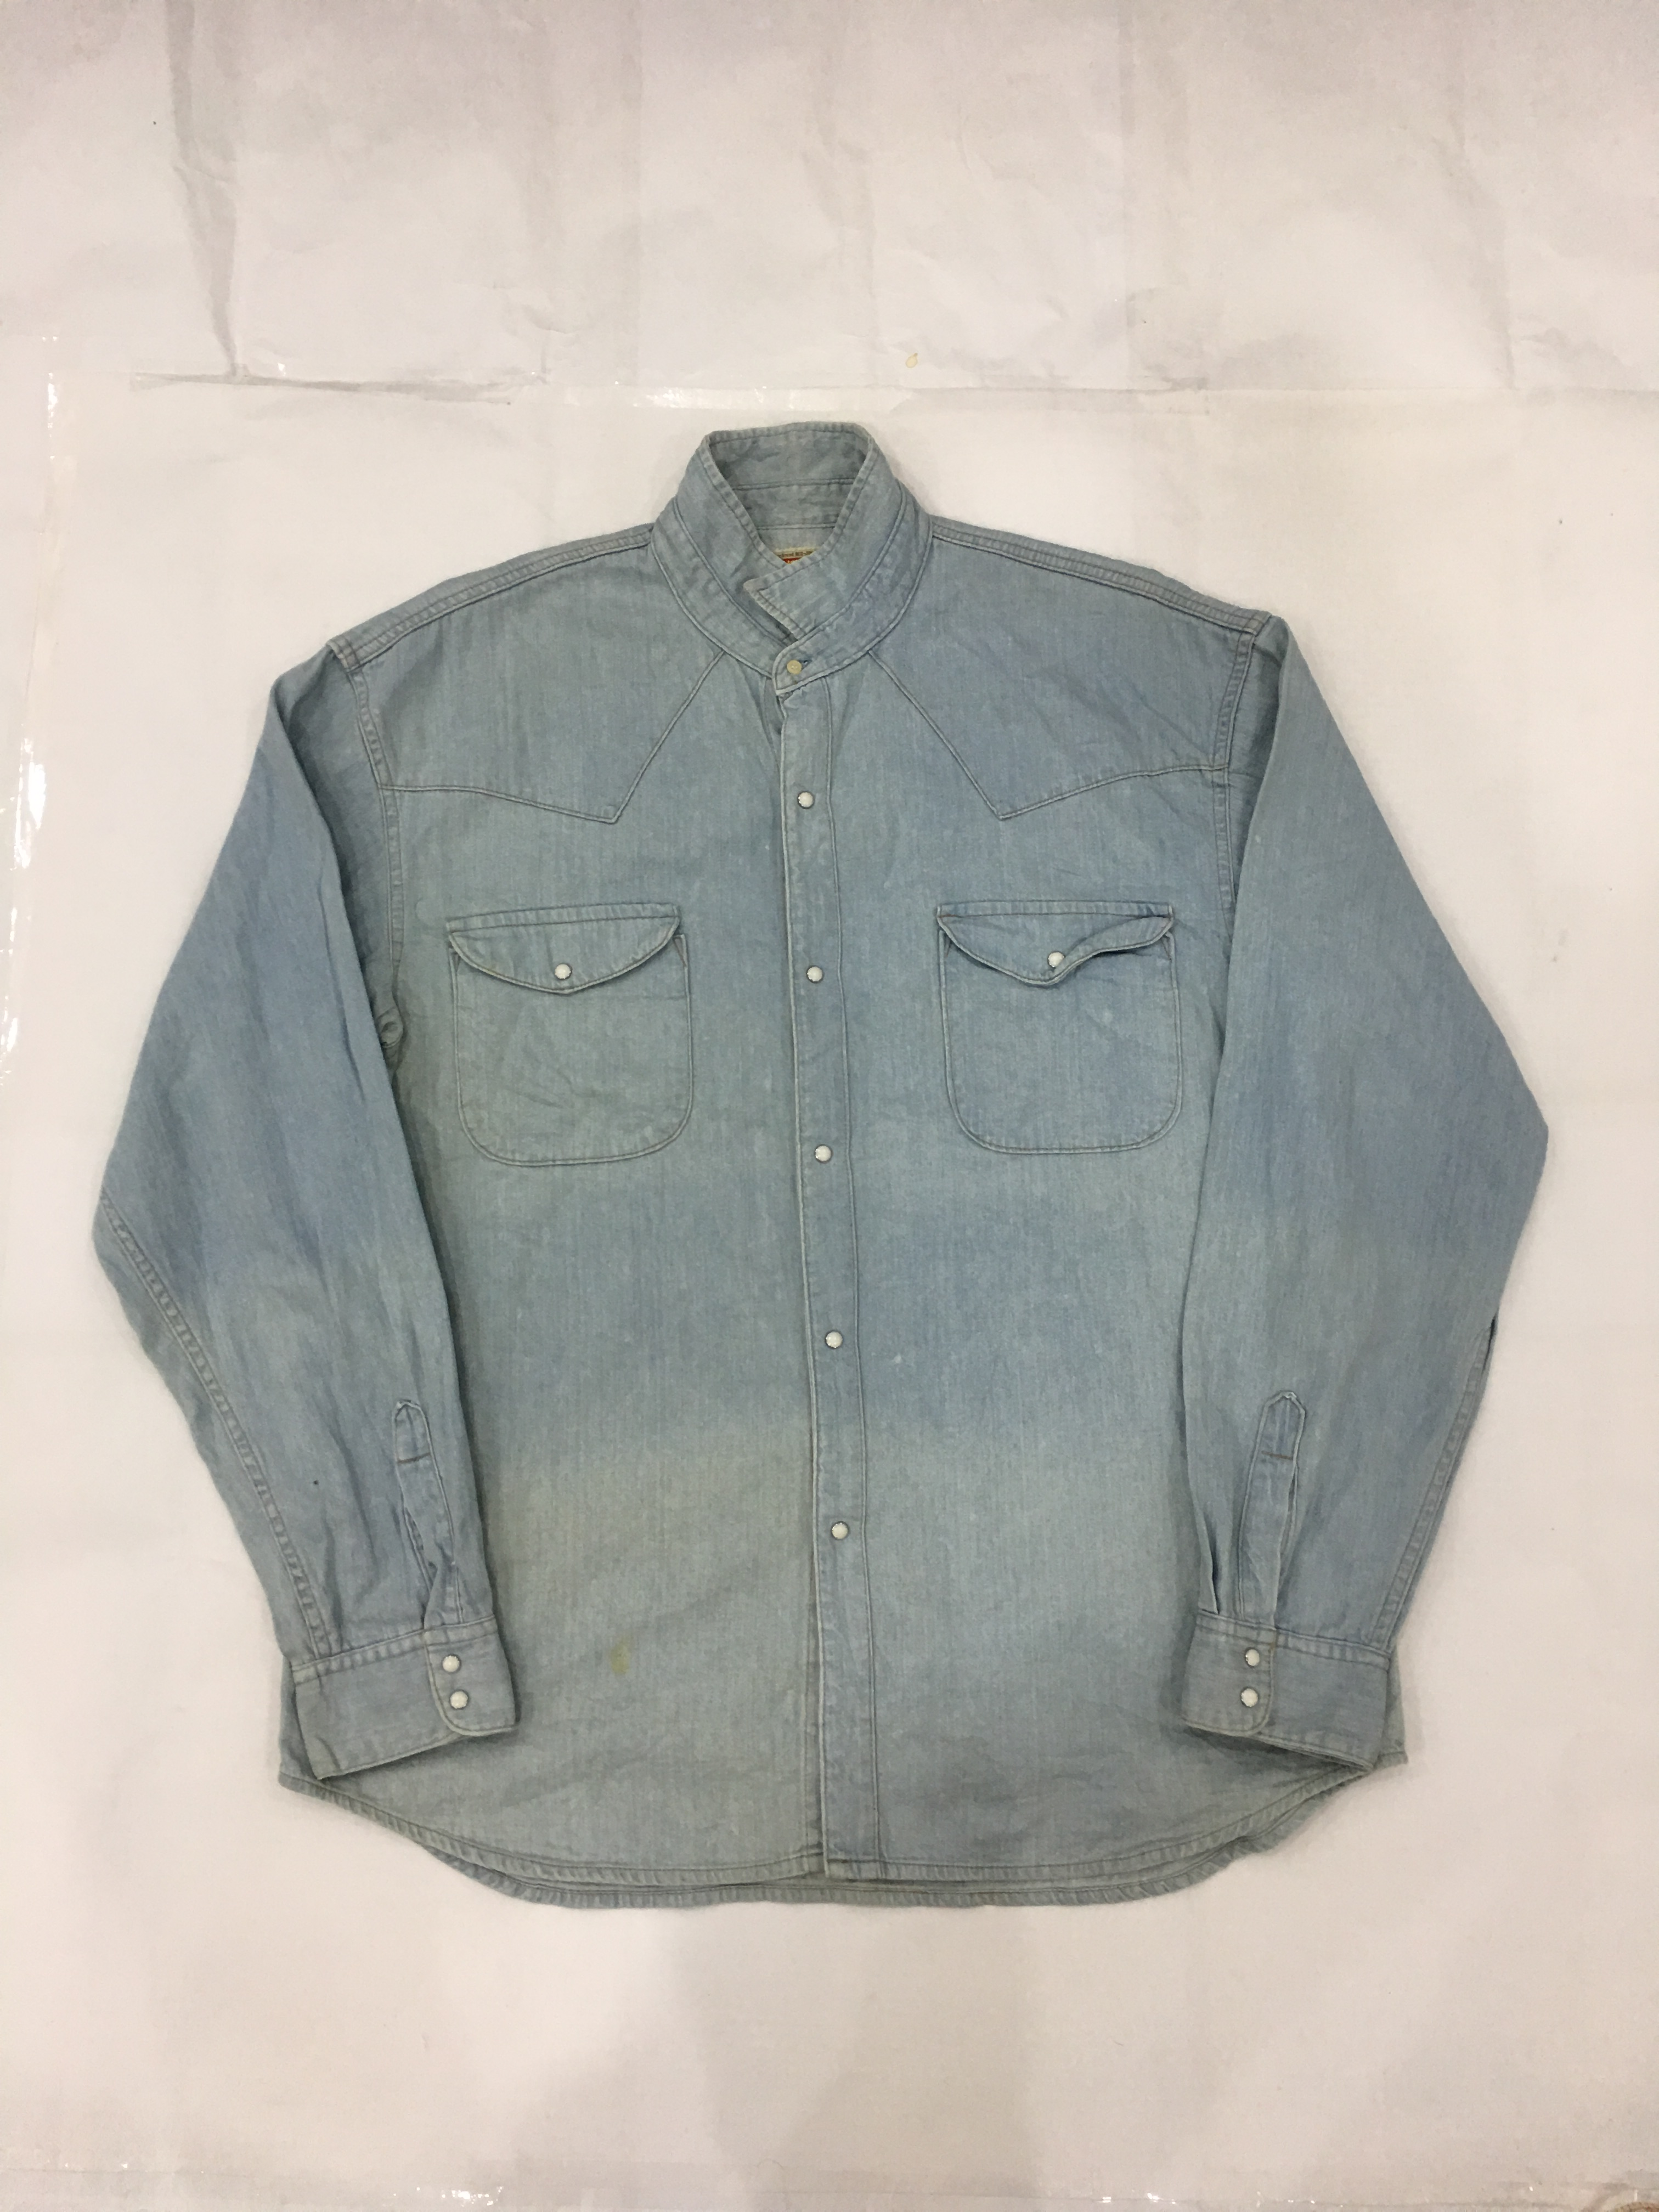 ea9939135ed1 Big John Big John Denim Shirt Men Western Shirt Chambray Blue With ...